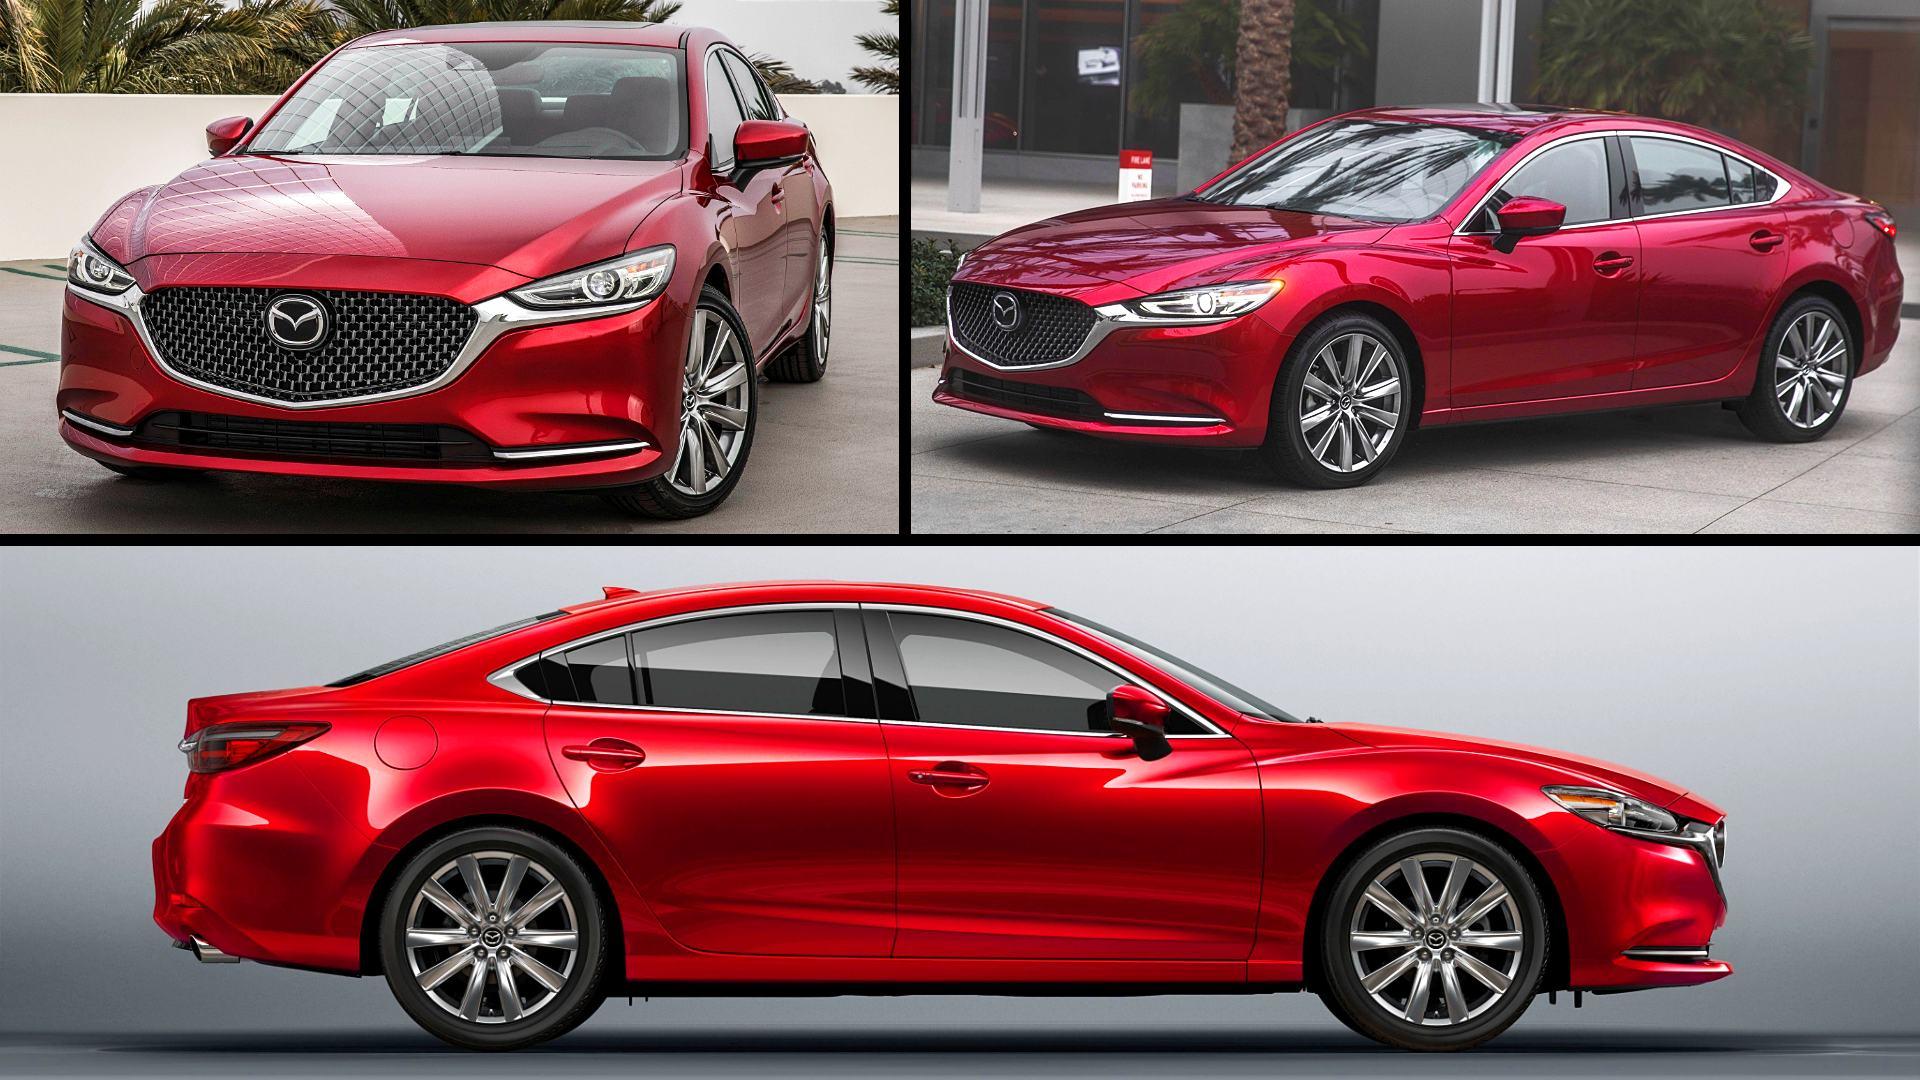 2020 Mazda 6 Turbo Hatchback Pictures Images